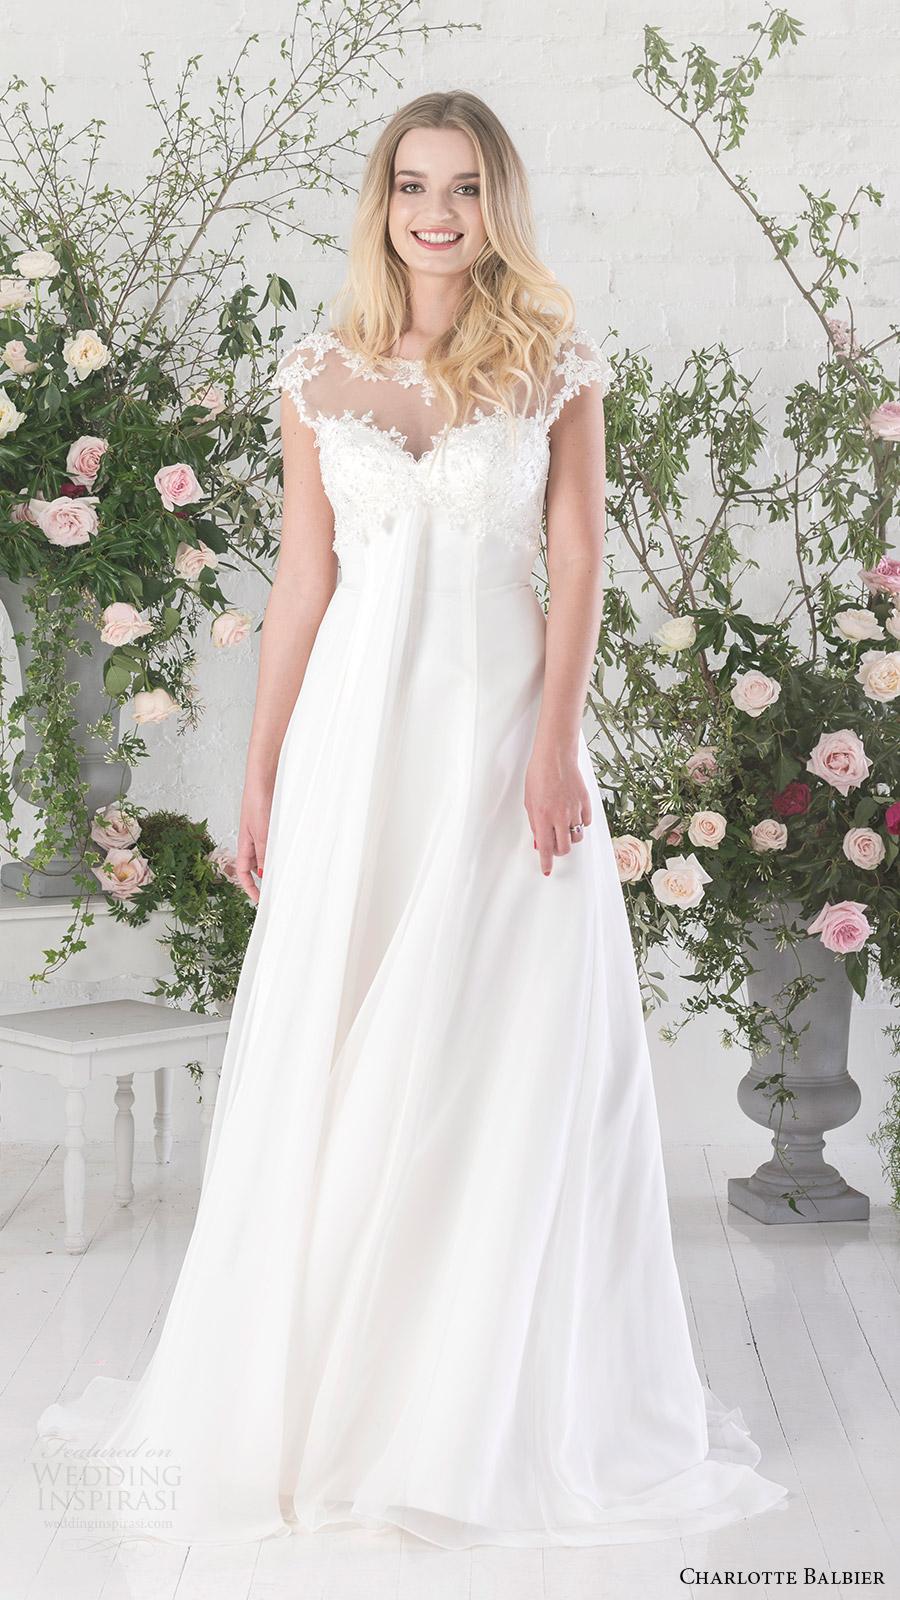 charlotte balbier bridal 2017 cap sleeves illusion bateau neck aline wedding dress (sofia) mv